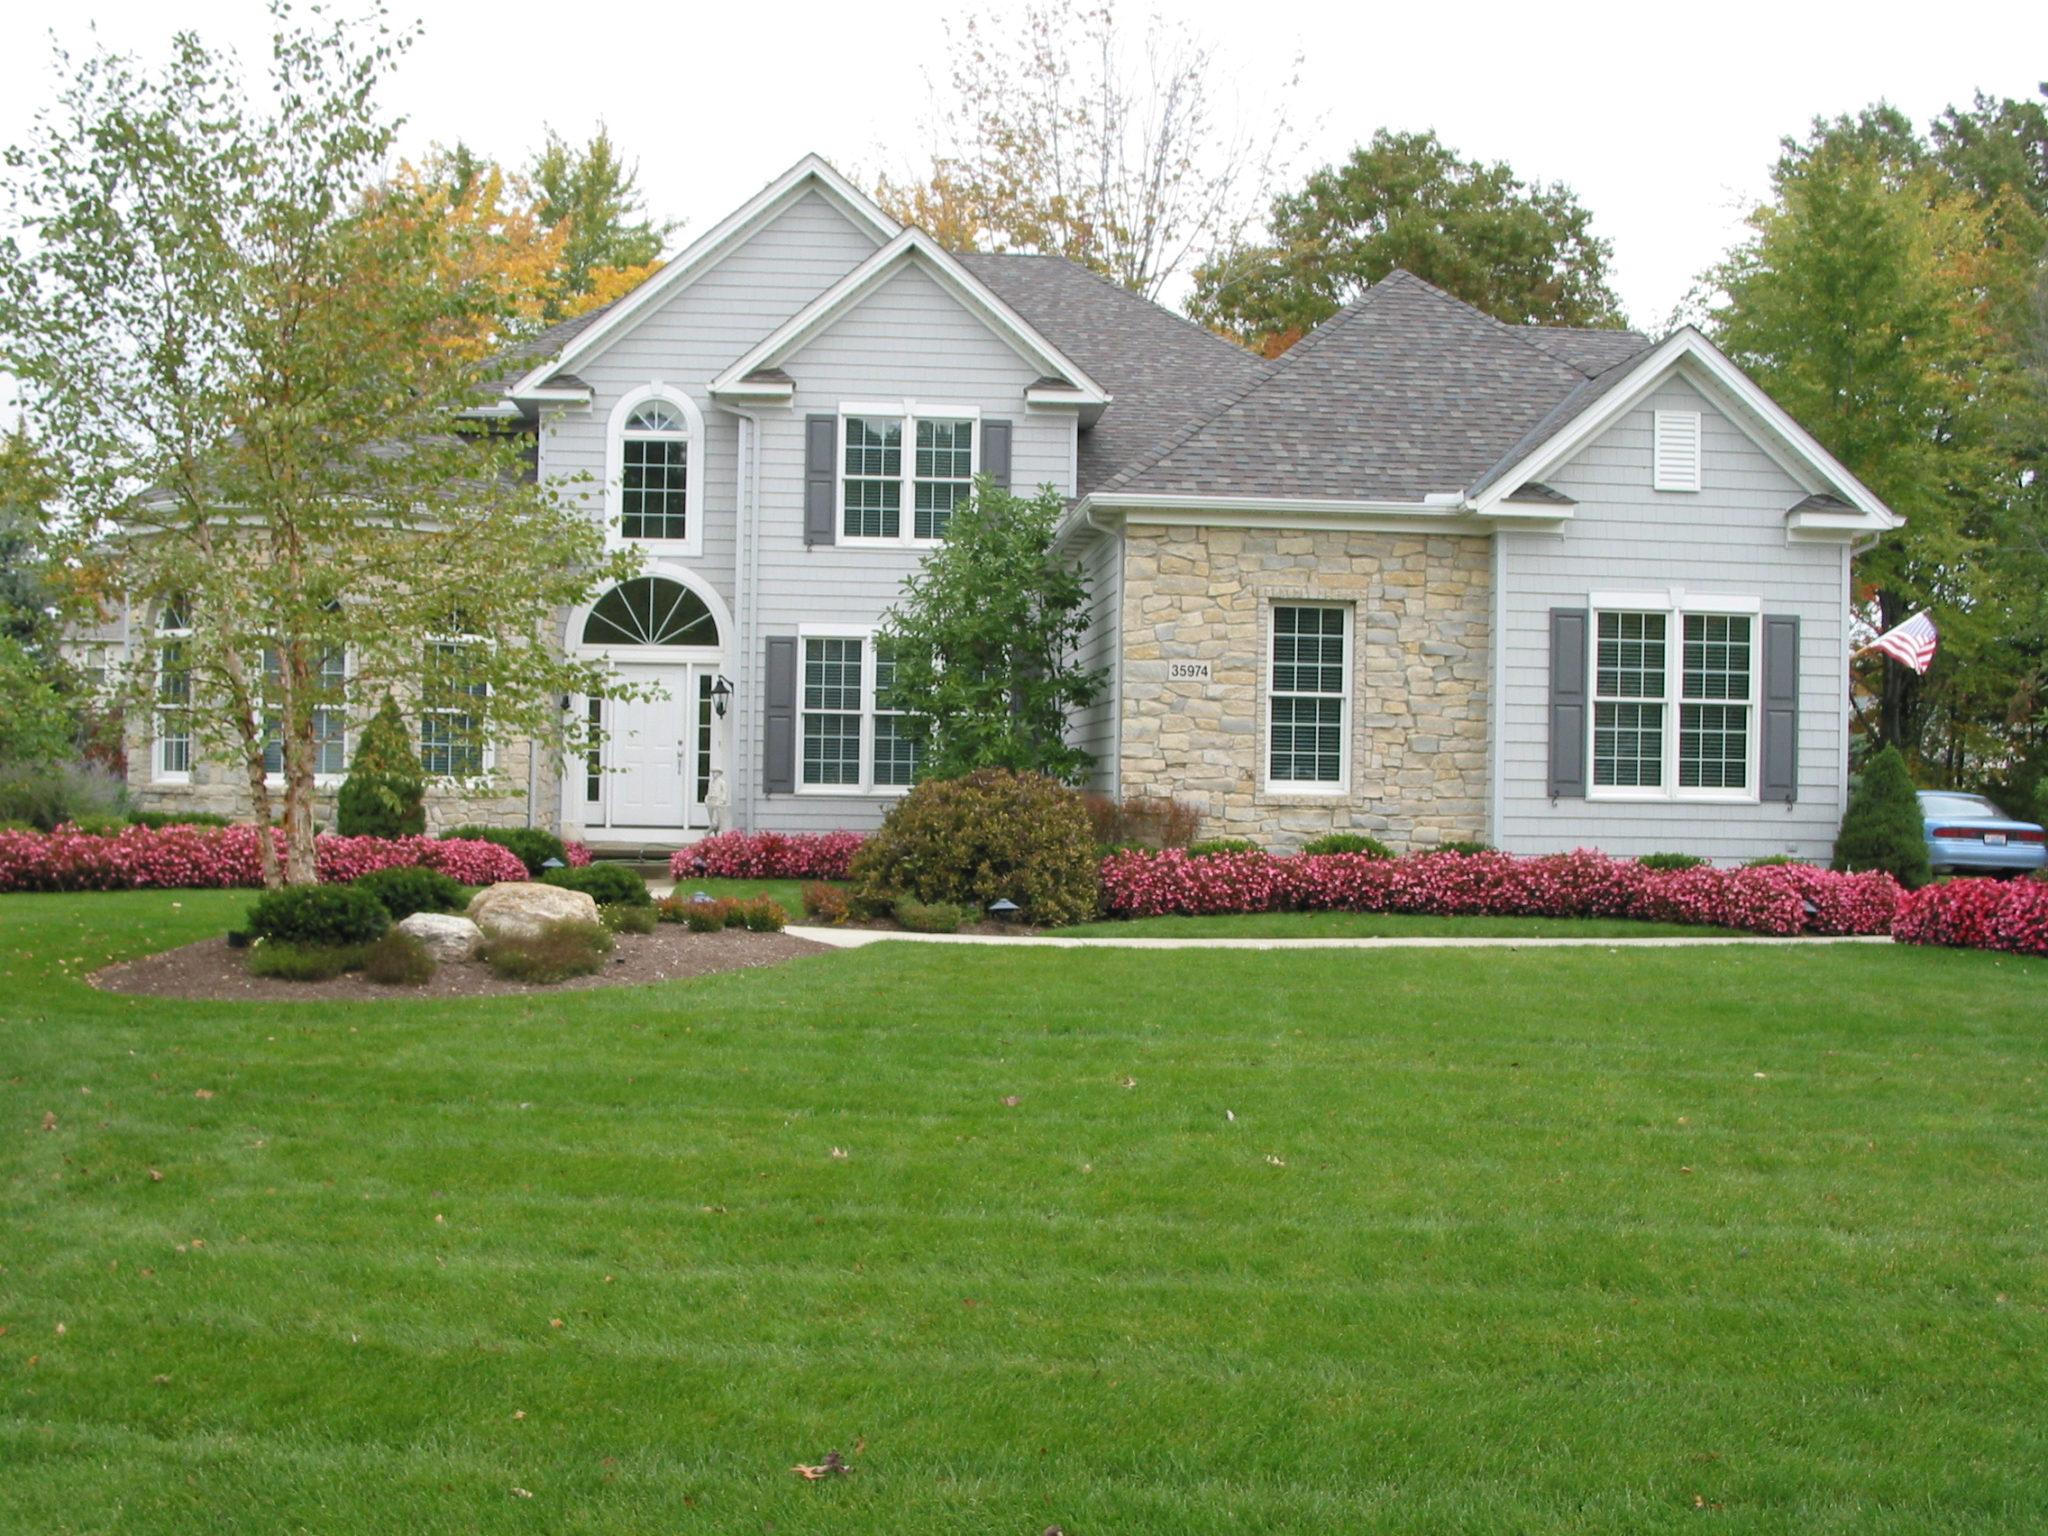 Galik Building constructs custom homes in Avon, OH